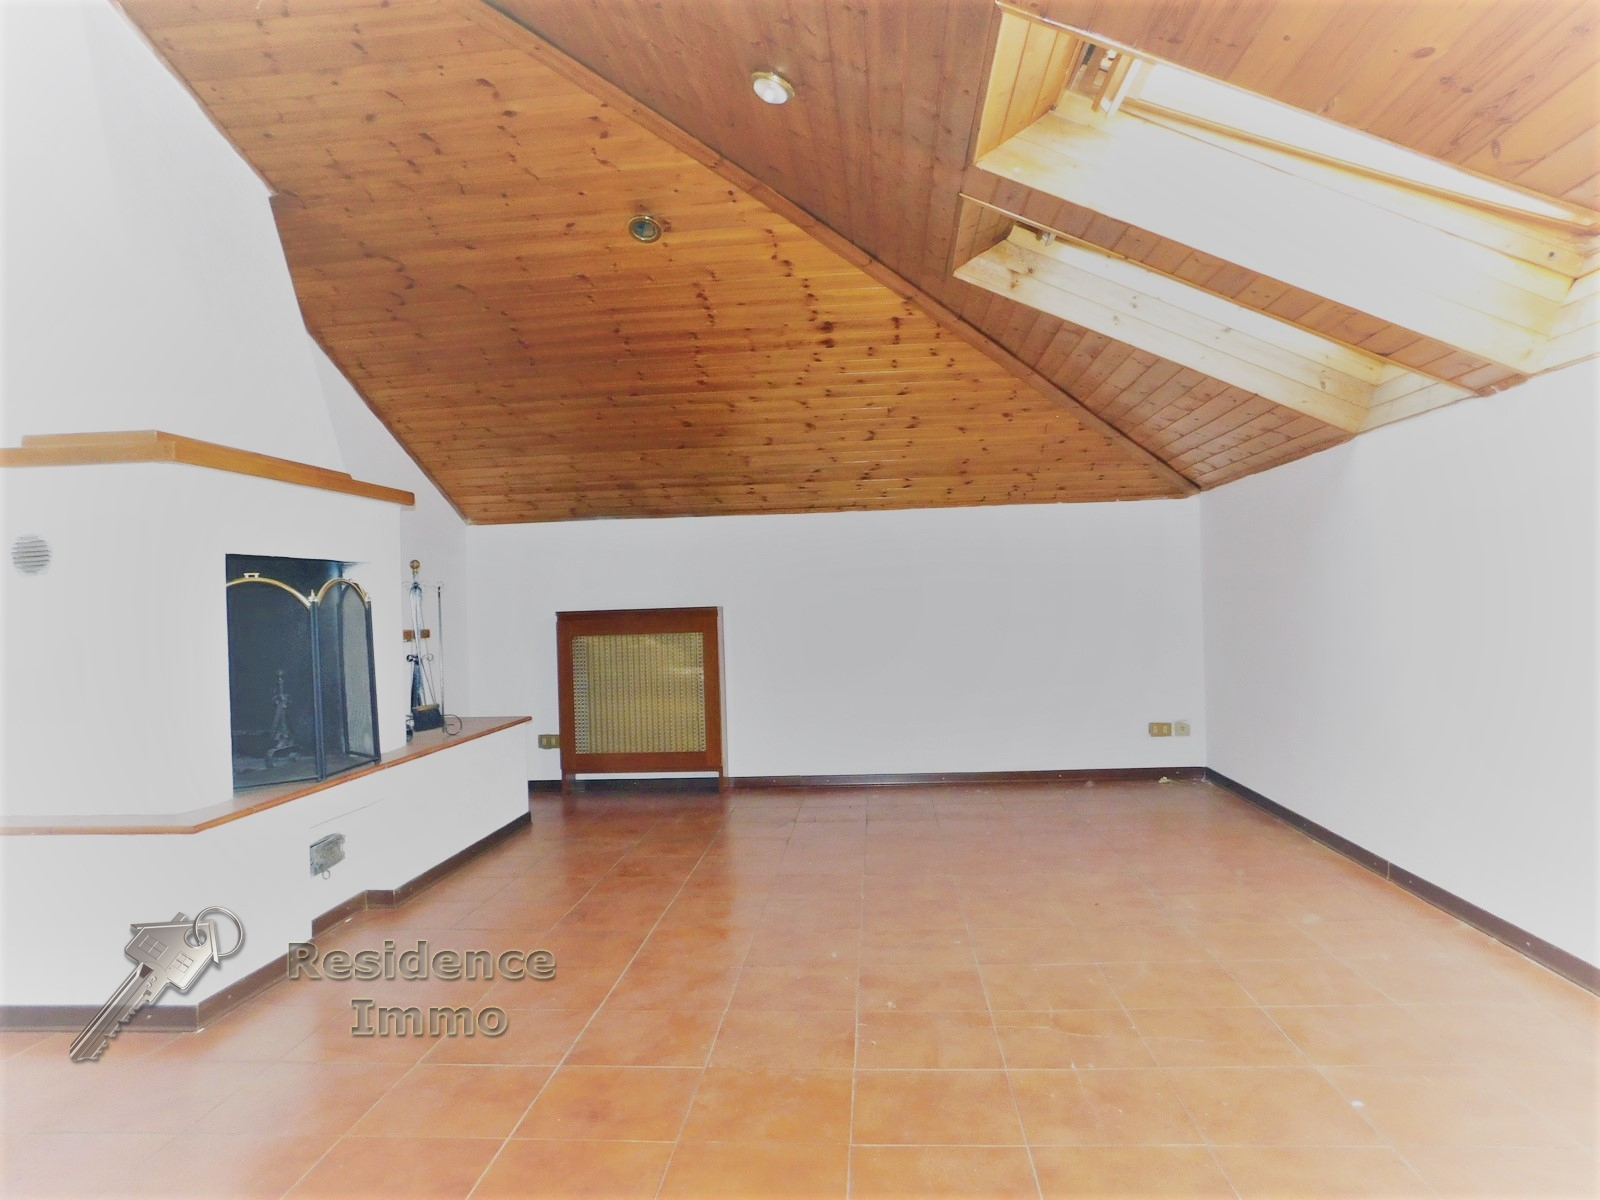 wohnung attika kaufen in bolzano bozen kodex 2055. Black Bedroom Furniture Sets. Home Design Ideas